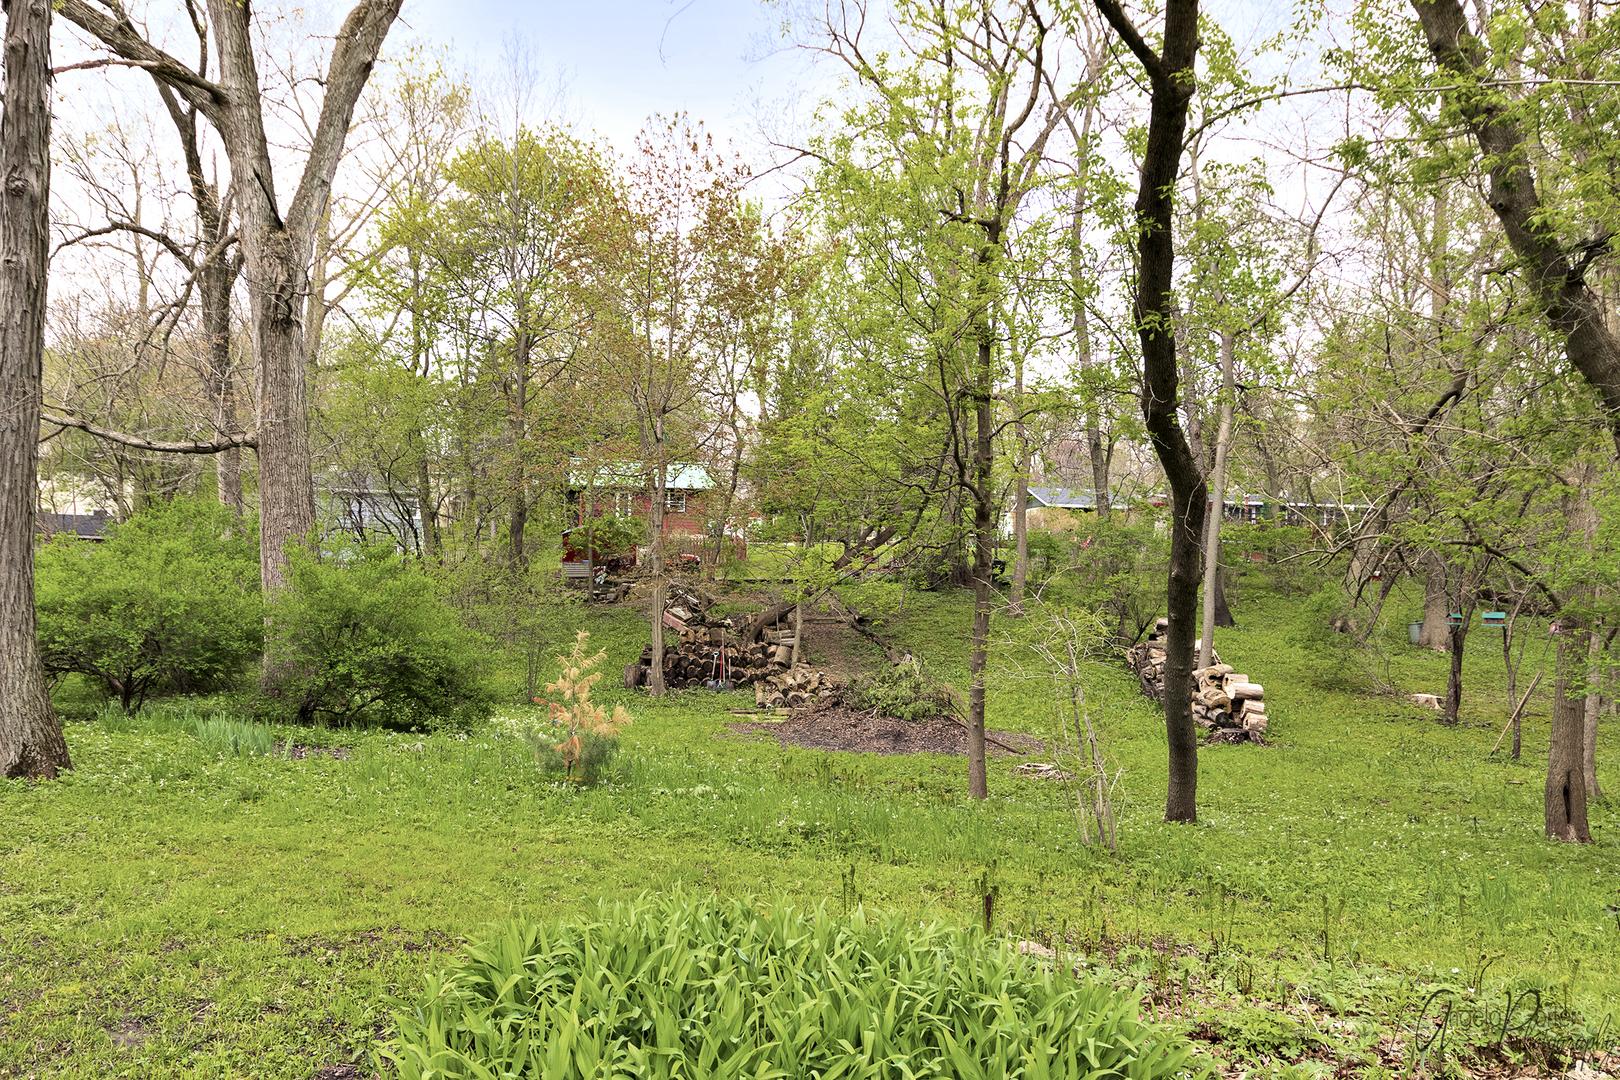 38433 North 3rd, Spring Grove, Illinois, 60081